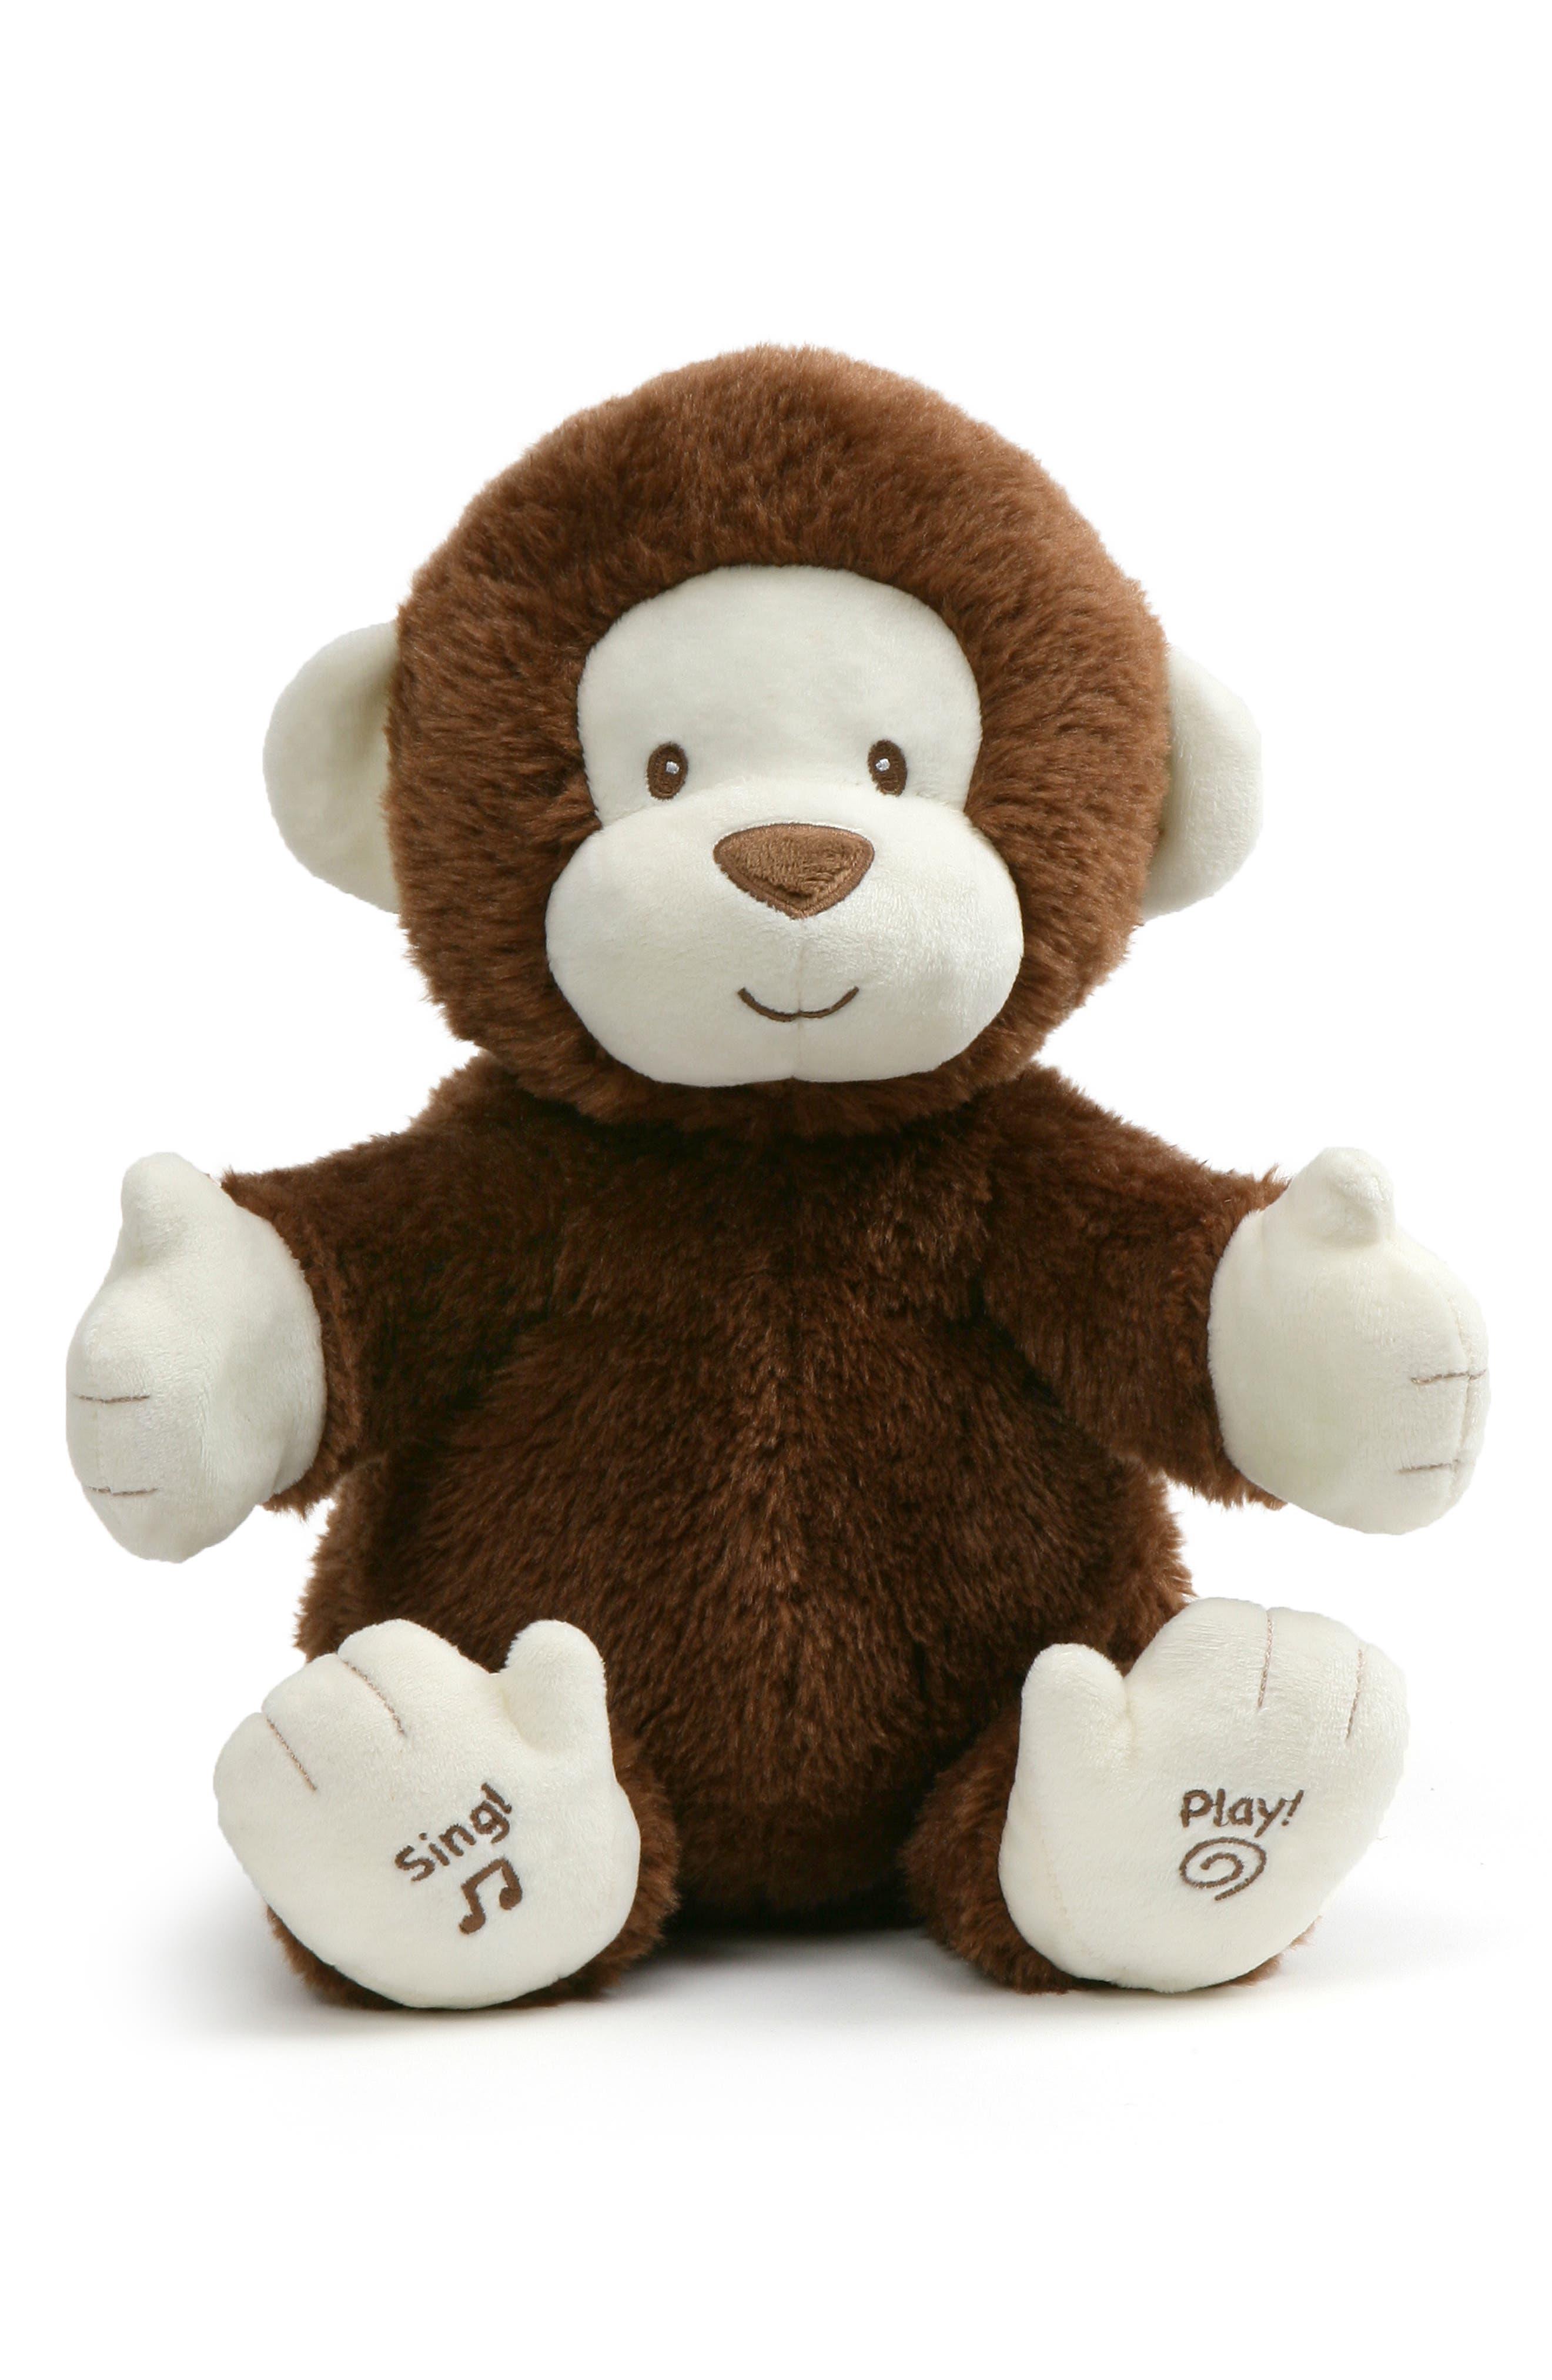 Toddler Gund Clappy The Monkey Musical Stuffed Animal